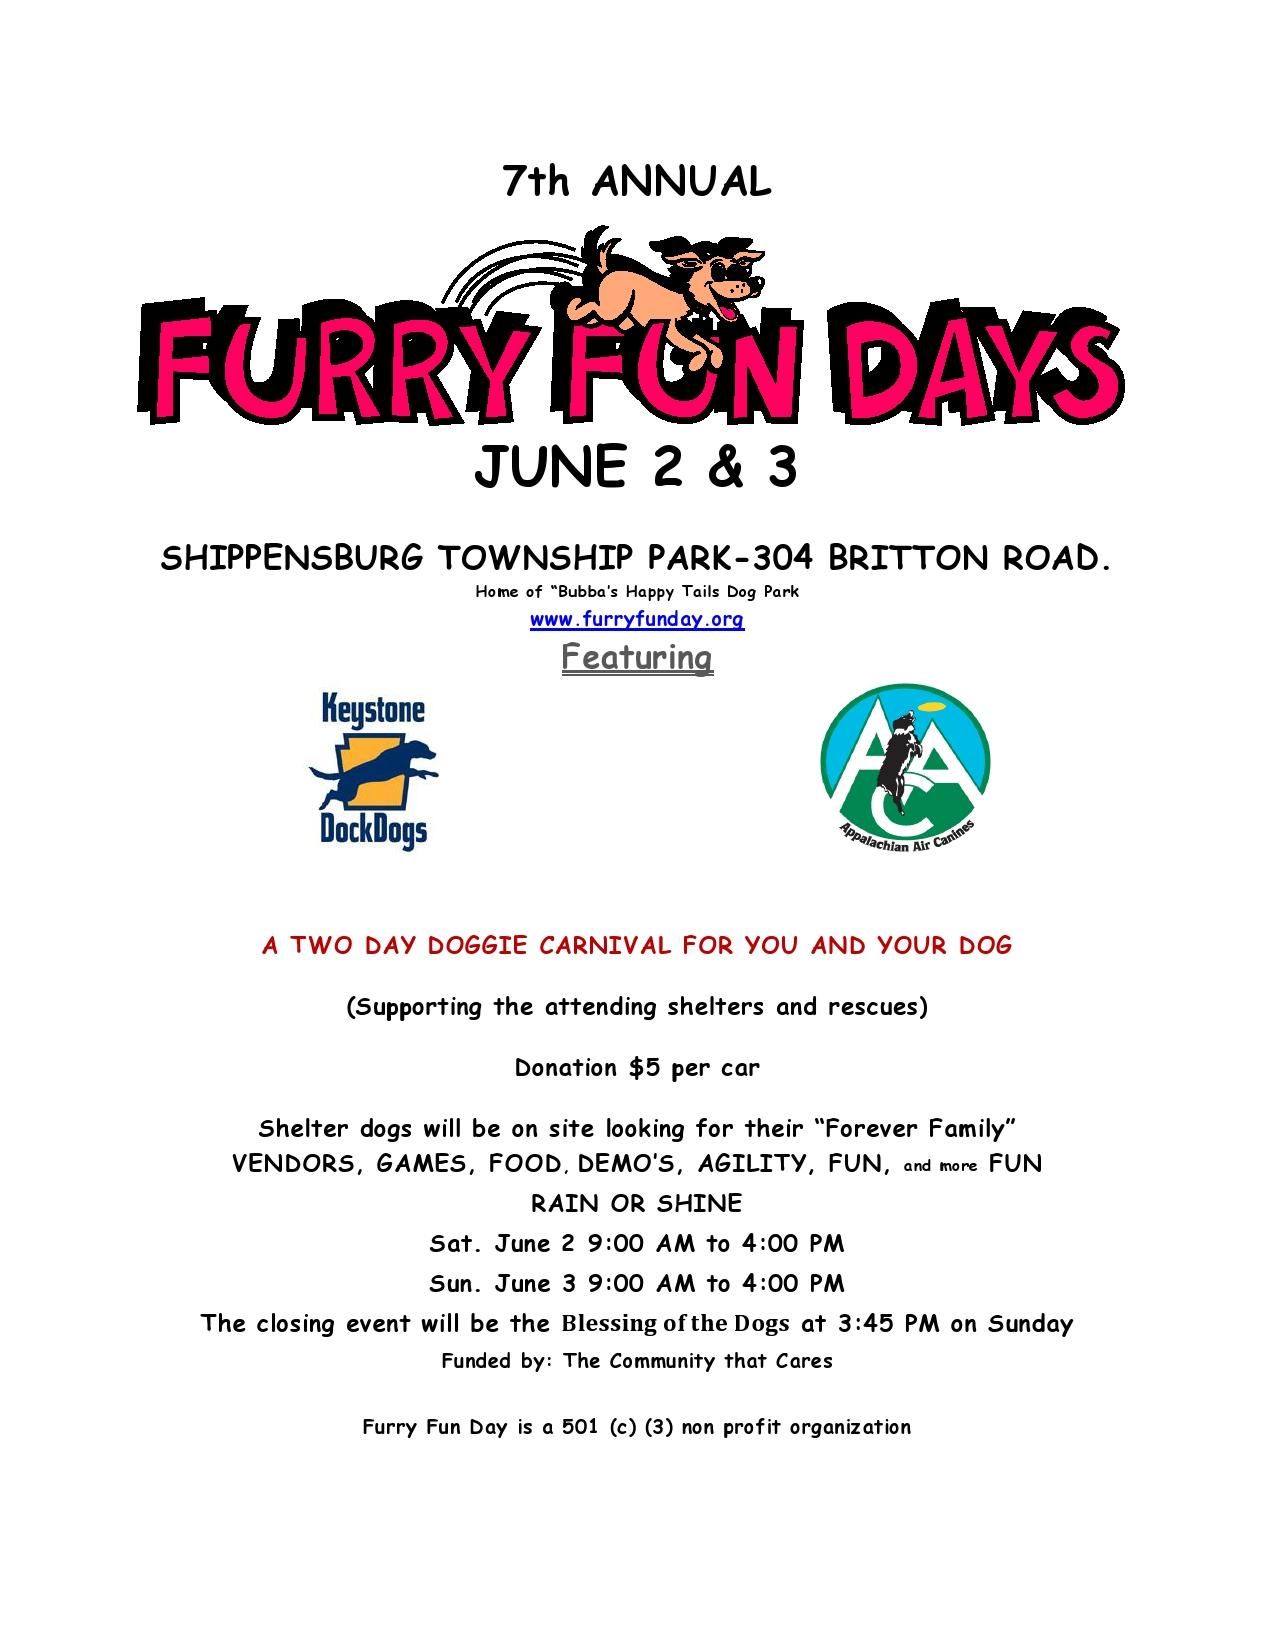 [Events] Furry Fun Days 2012